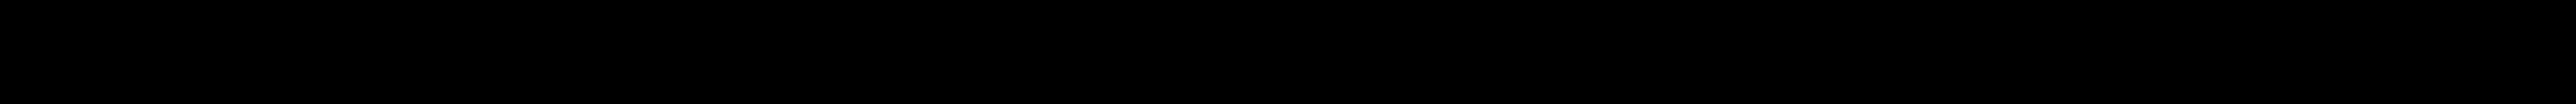 Text_divider-15